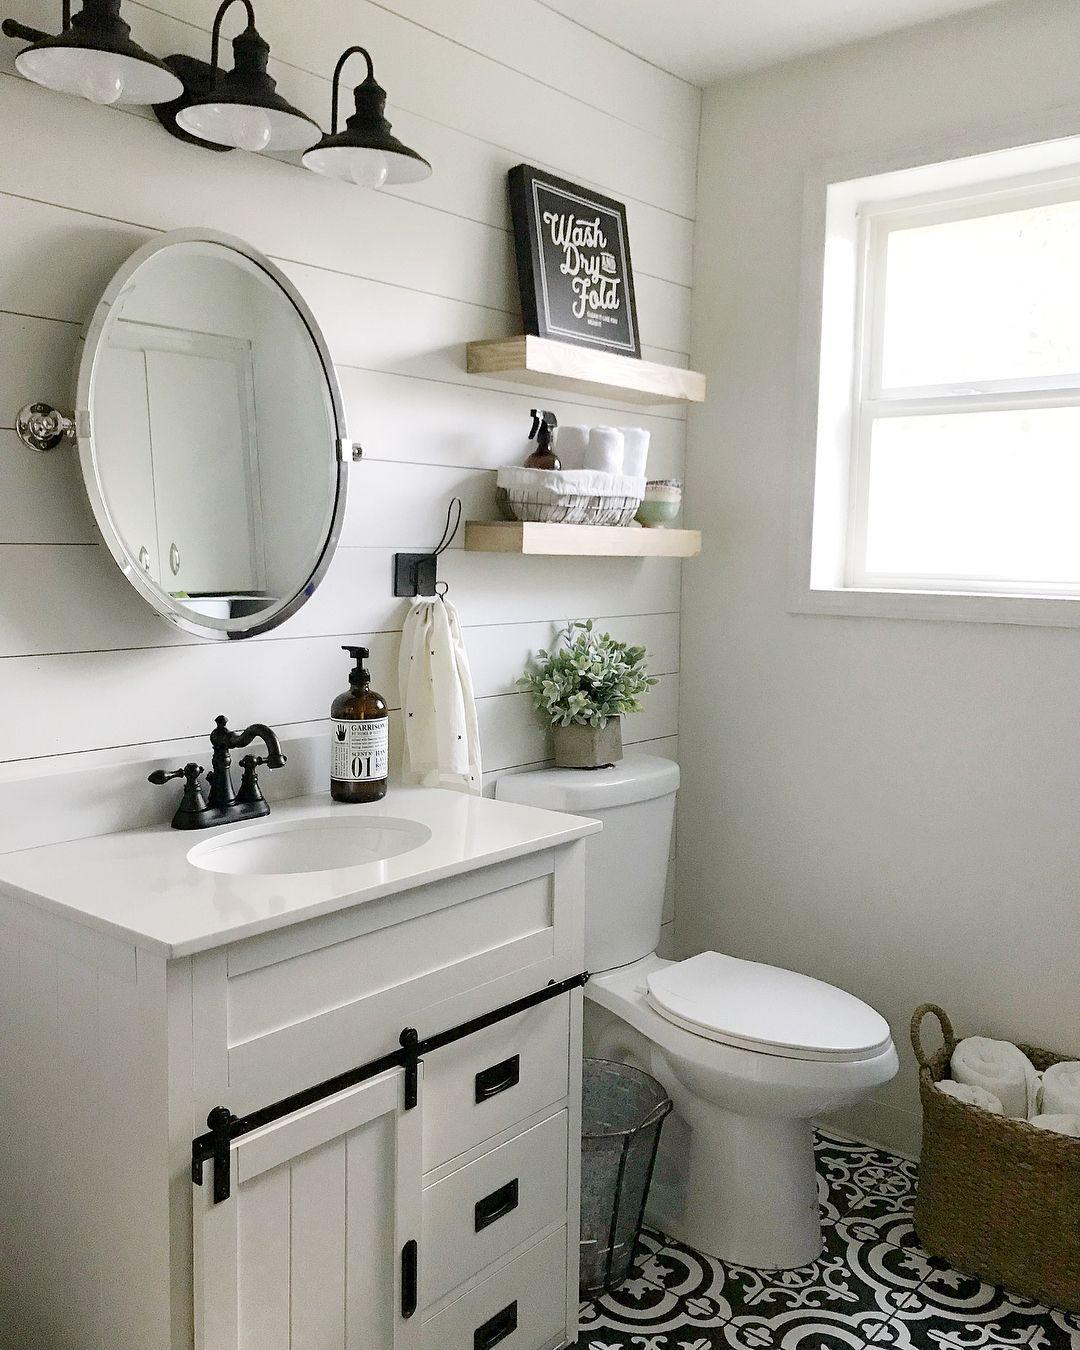 Goodbathroomdesigns Small Bathroom Makeover Small Bathroom Remodel Bathrooms Remodel